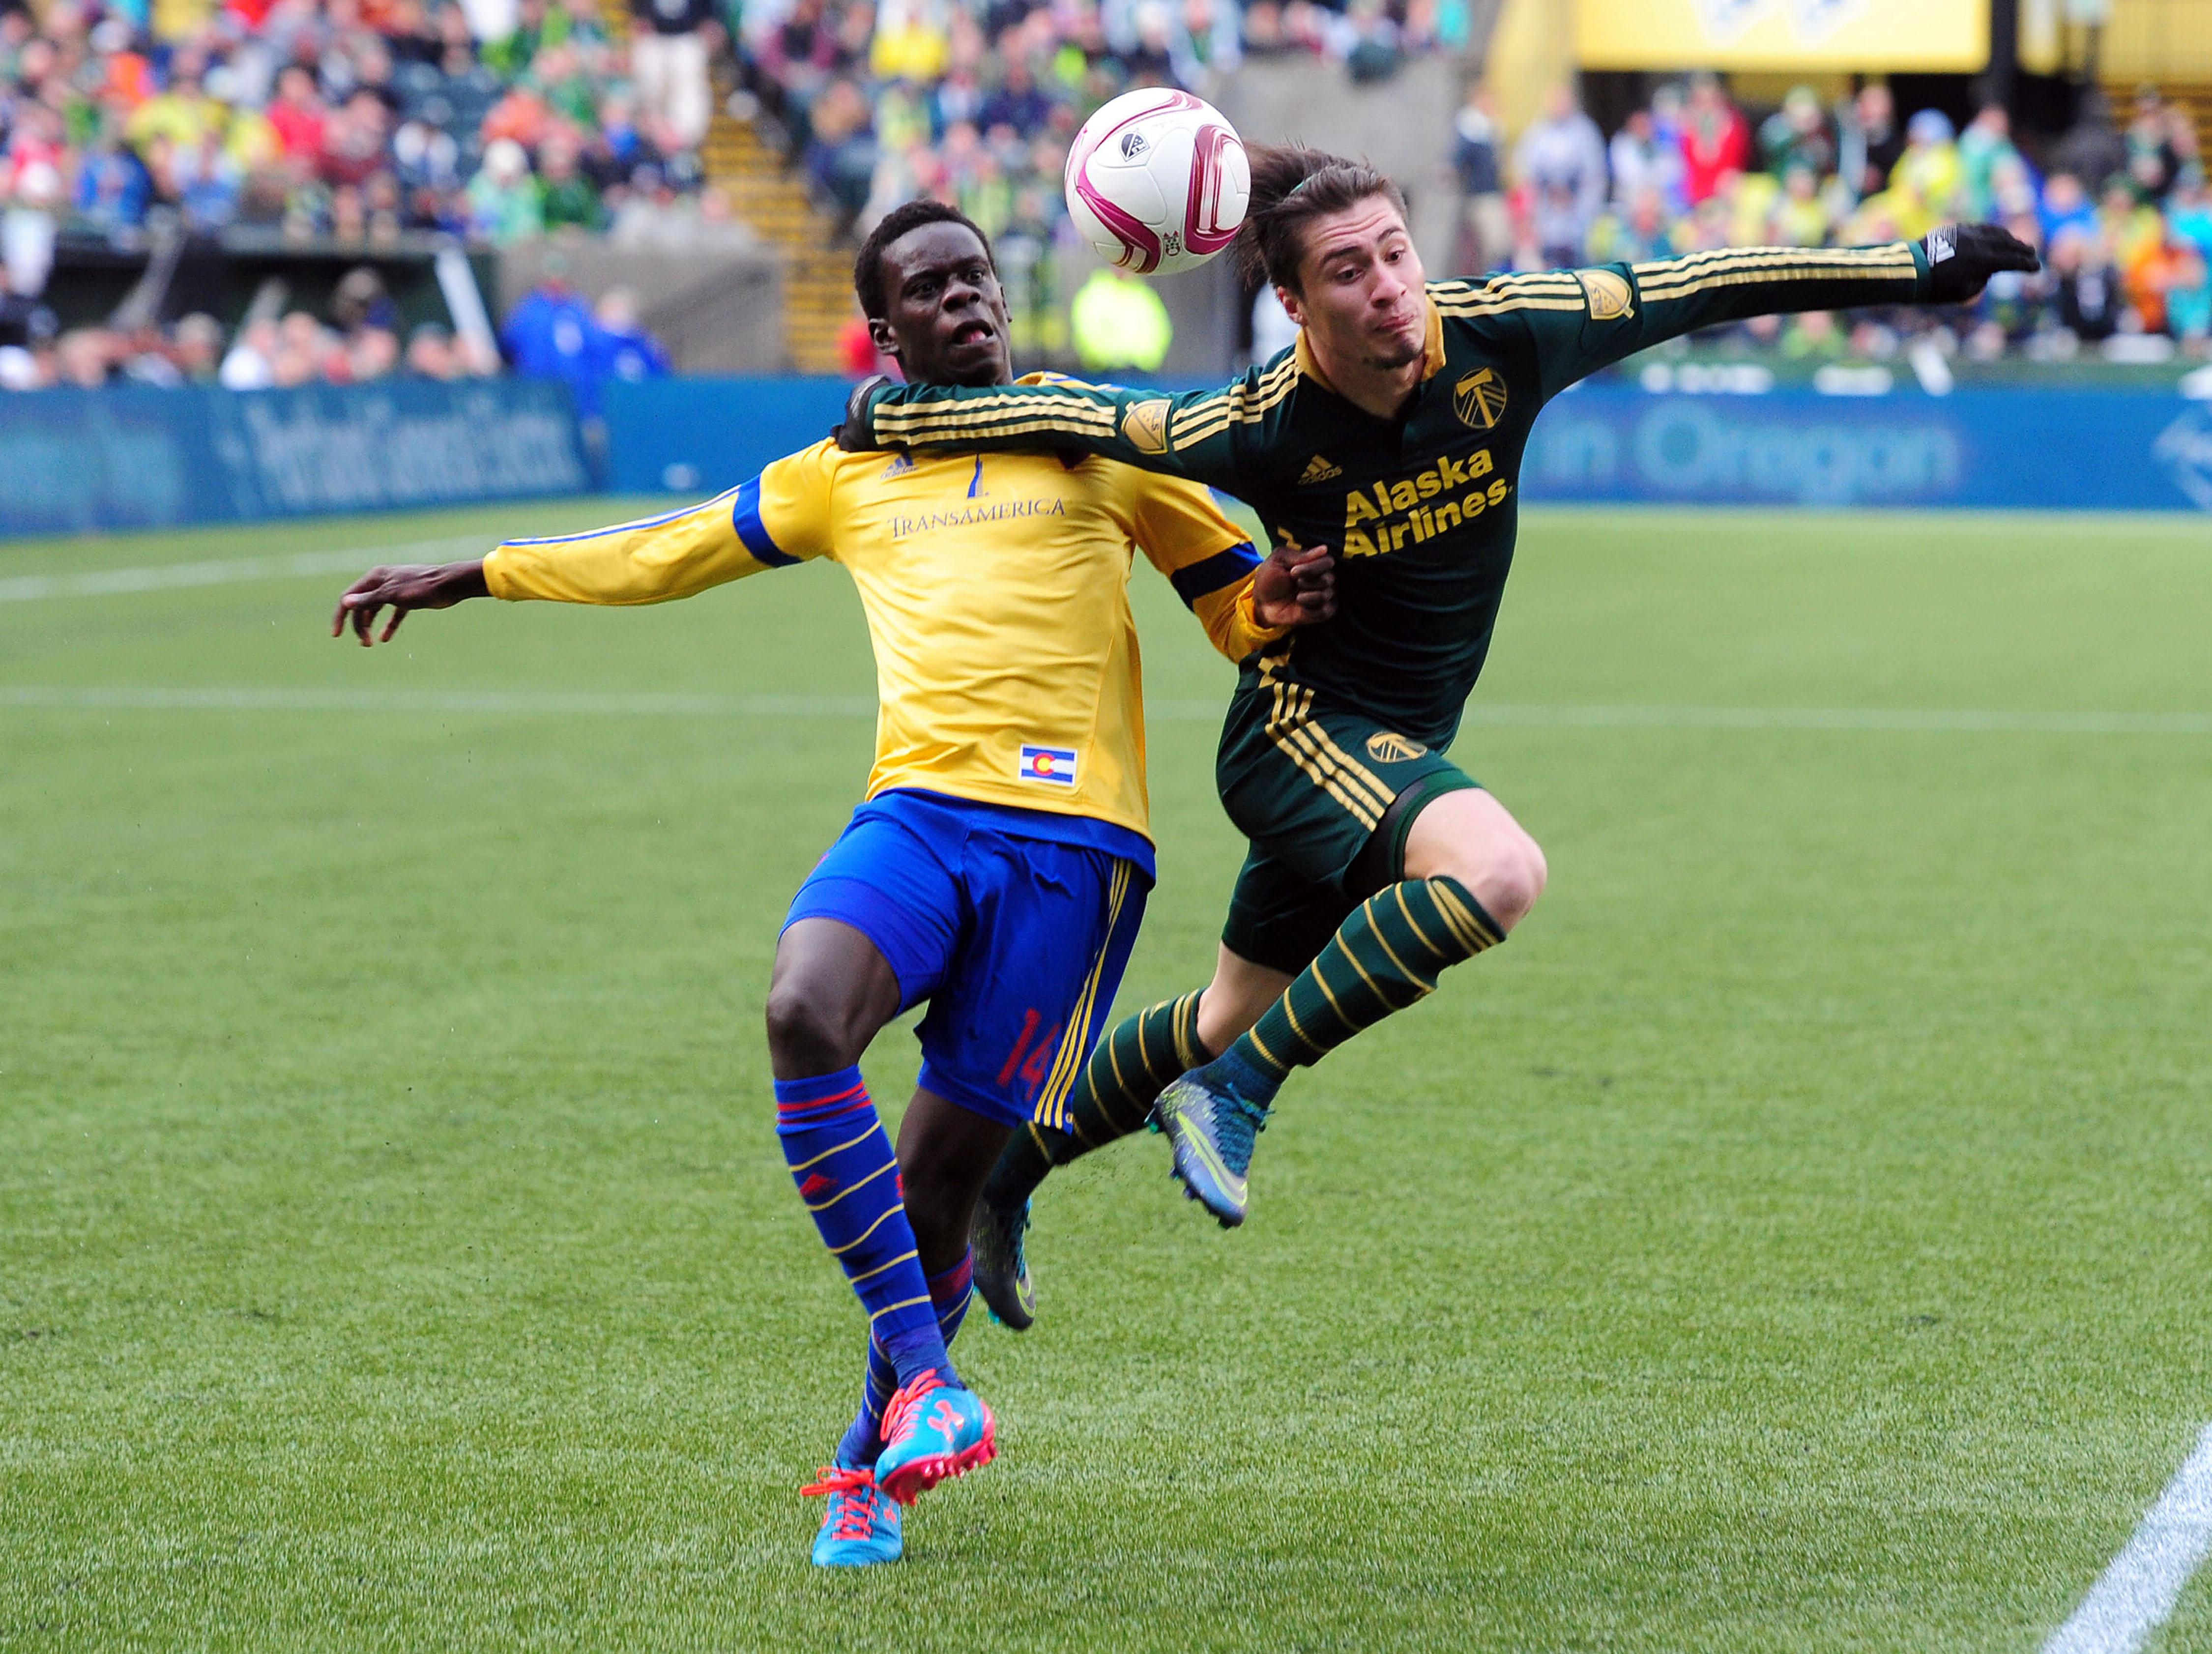 Badji and Villafana battle for the ball in the first half.